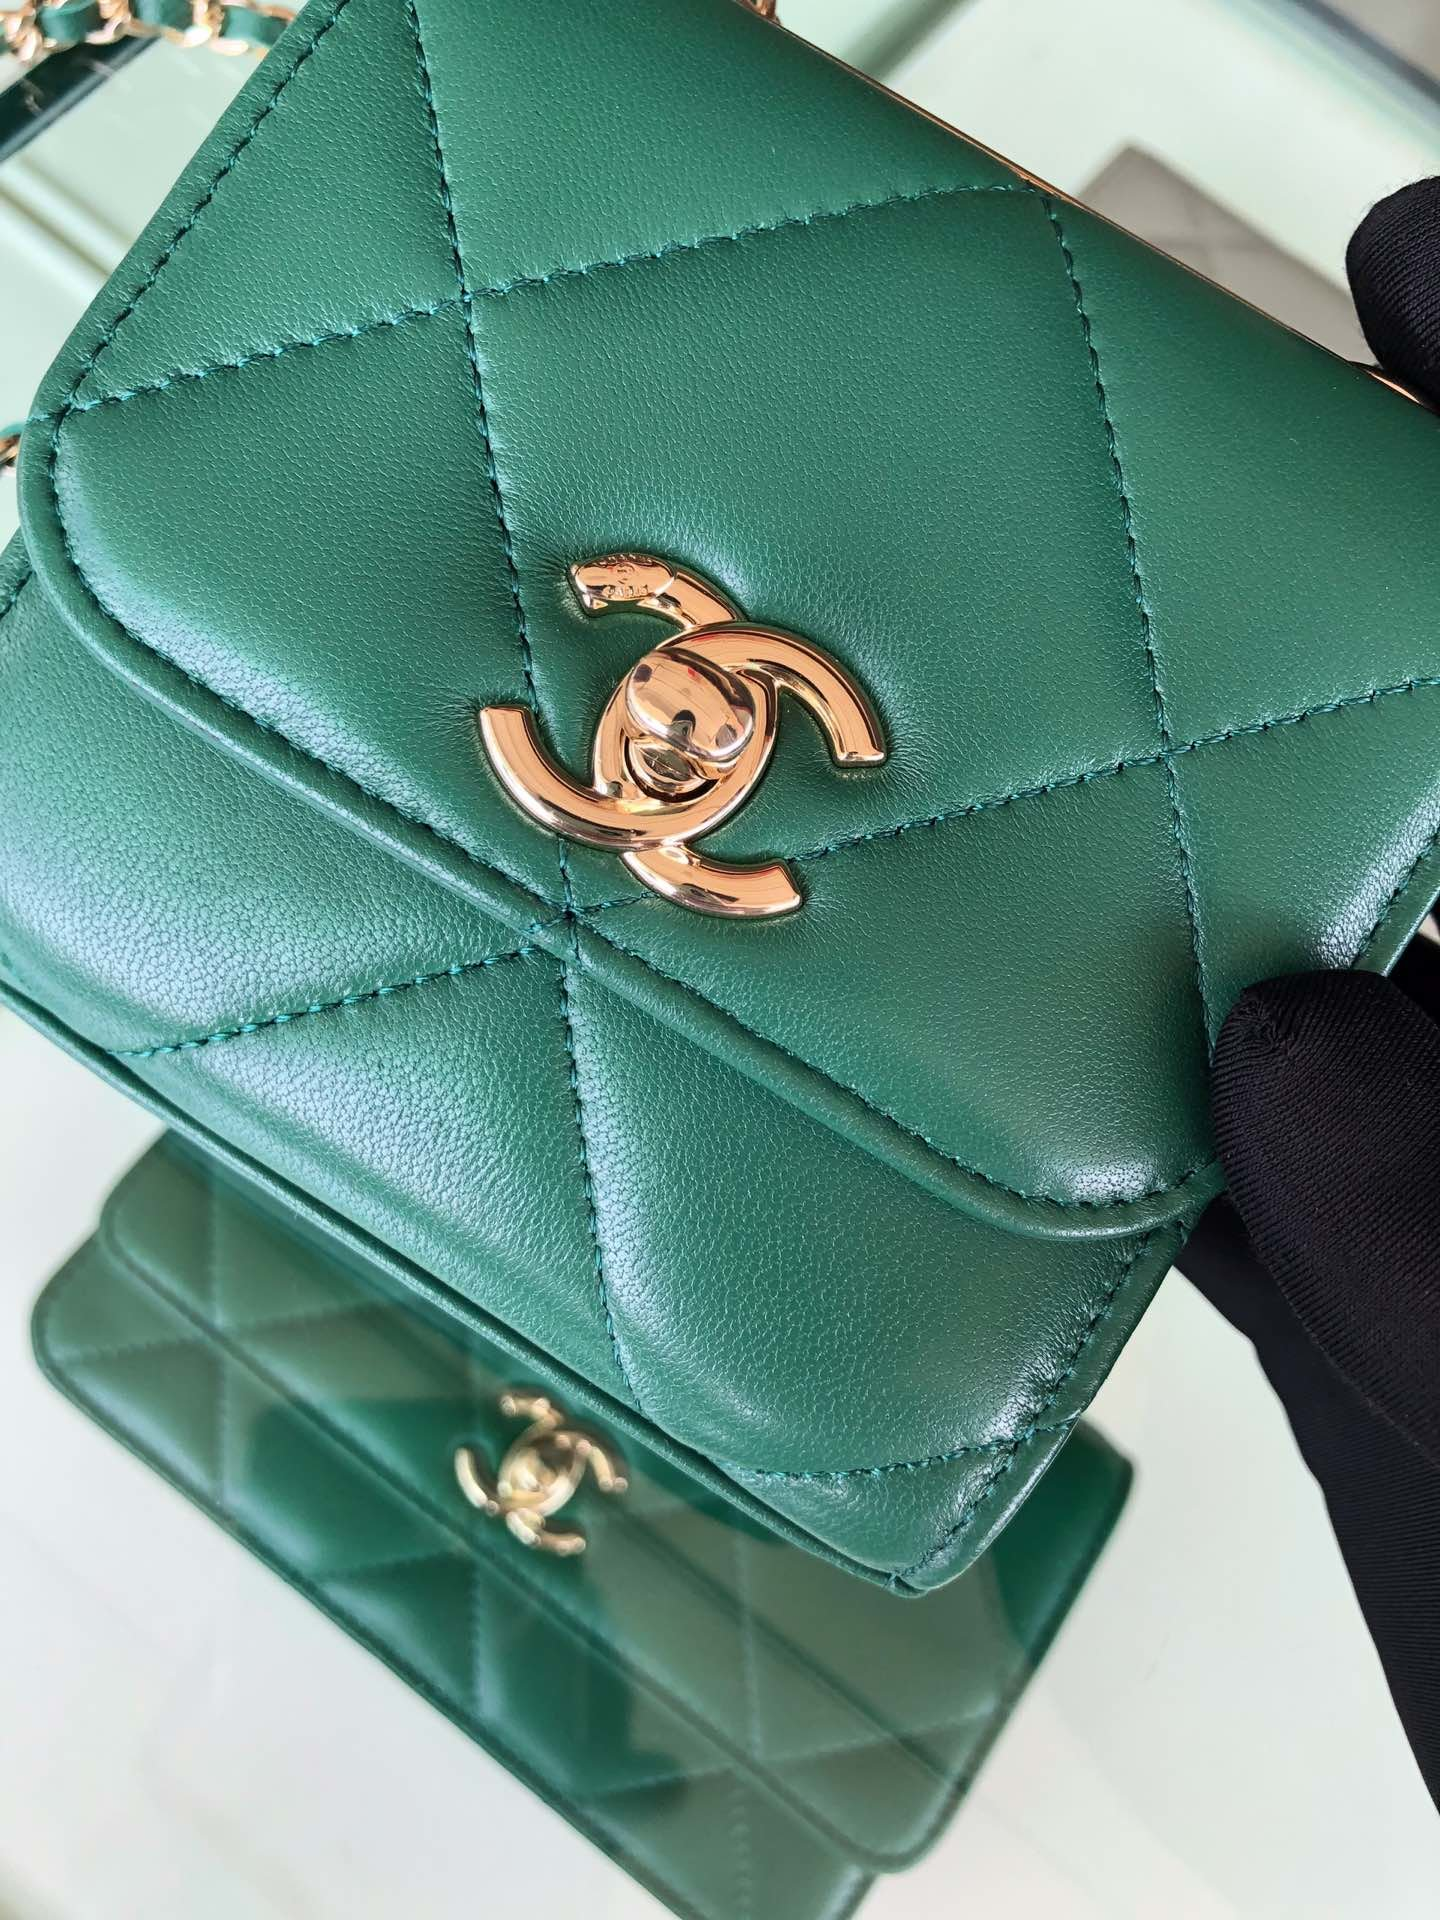 Chanel香奈儿专柜同款 大方格新款零钱包 单肩斜挎(图6)